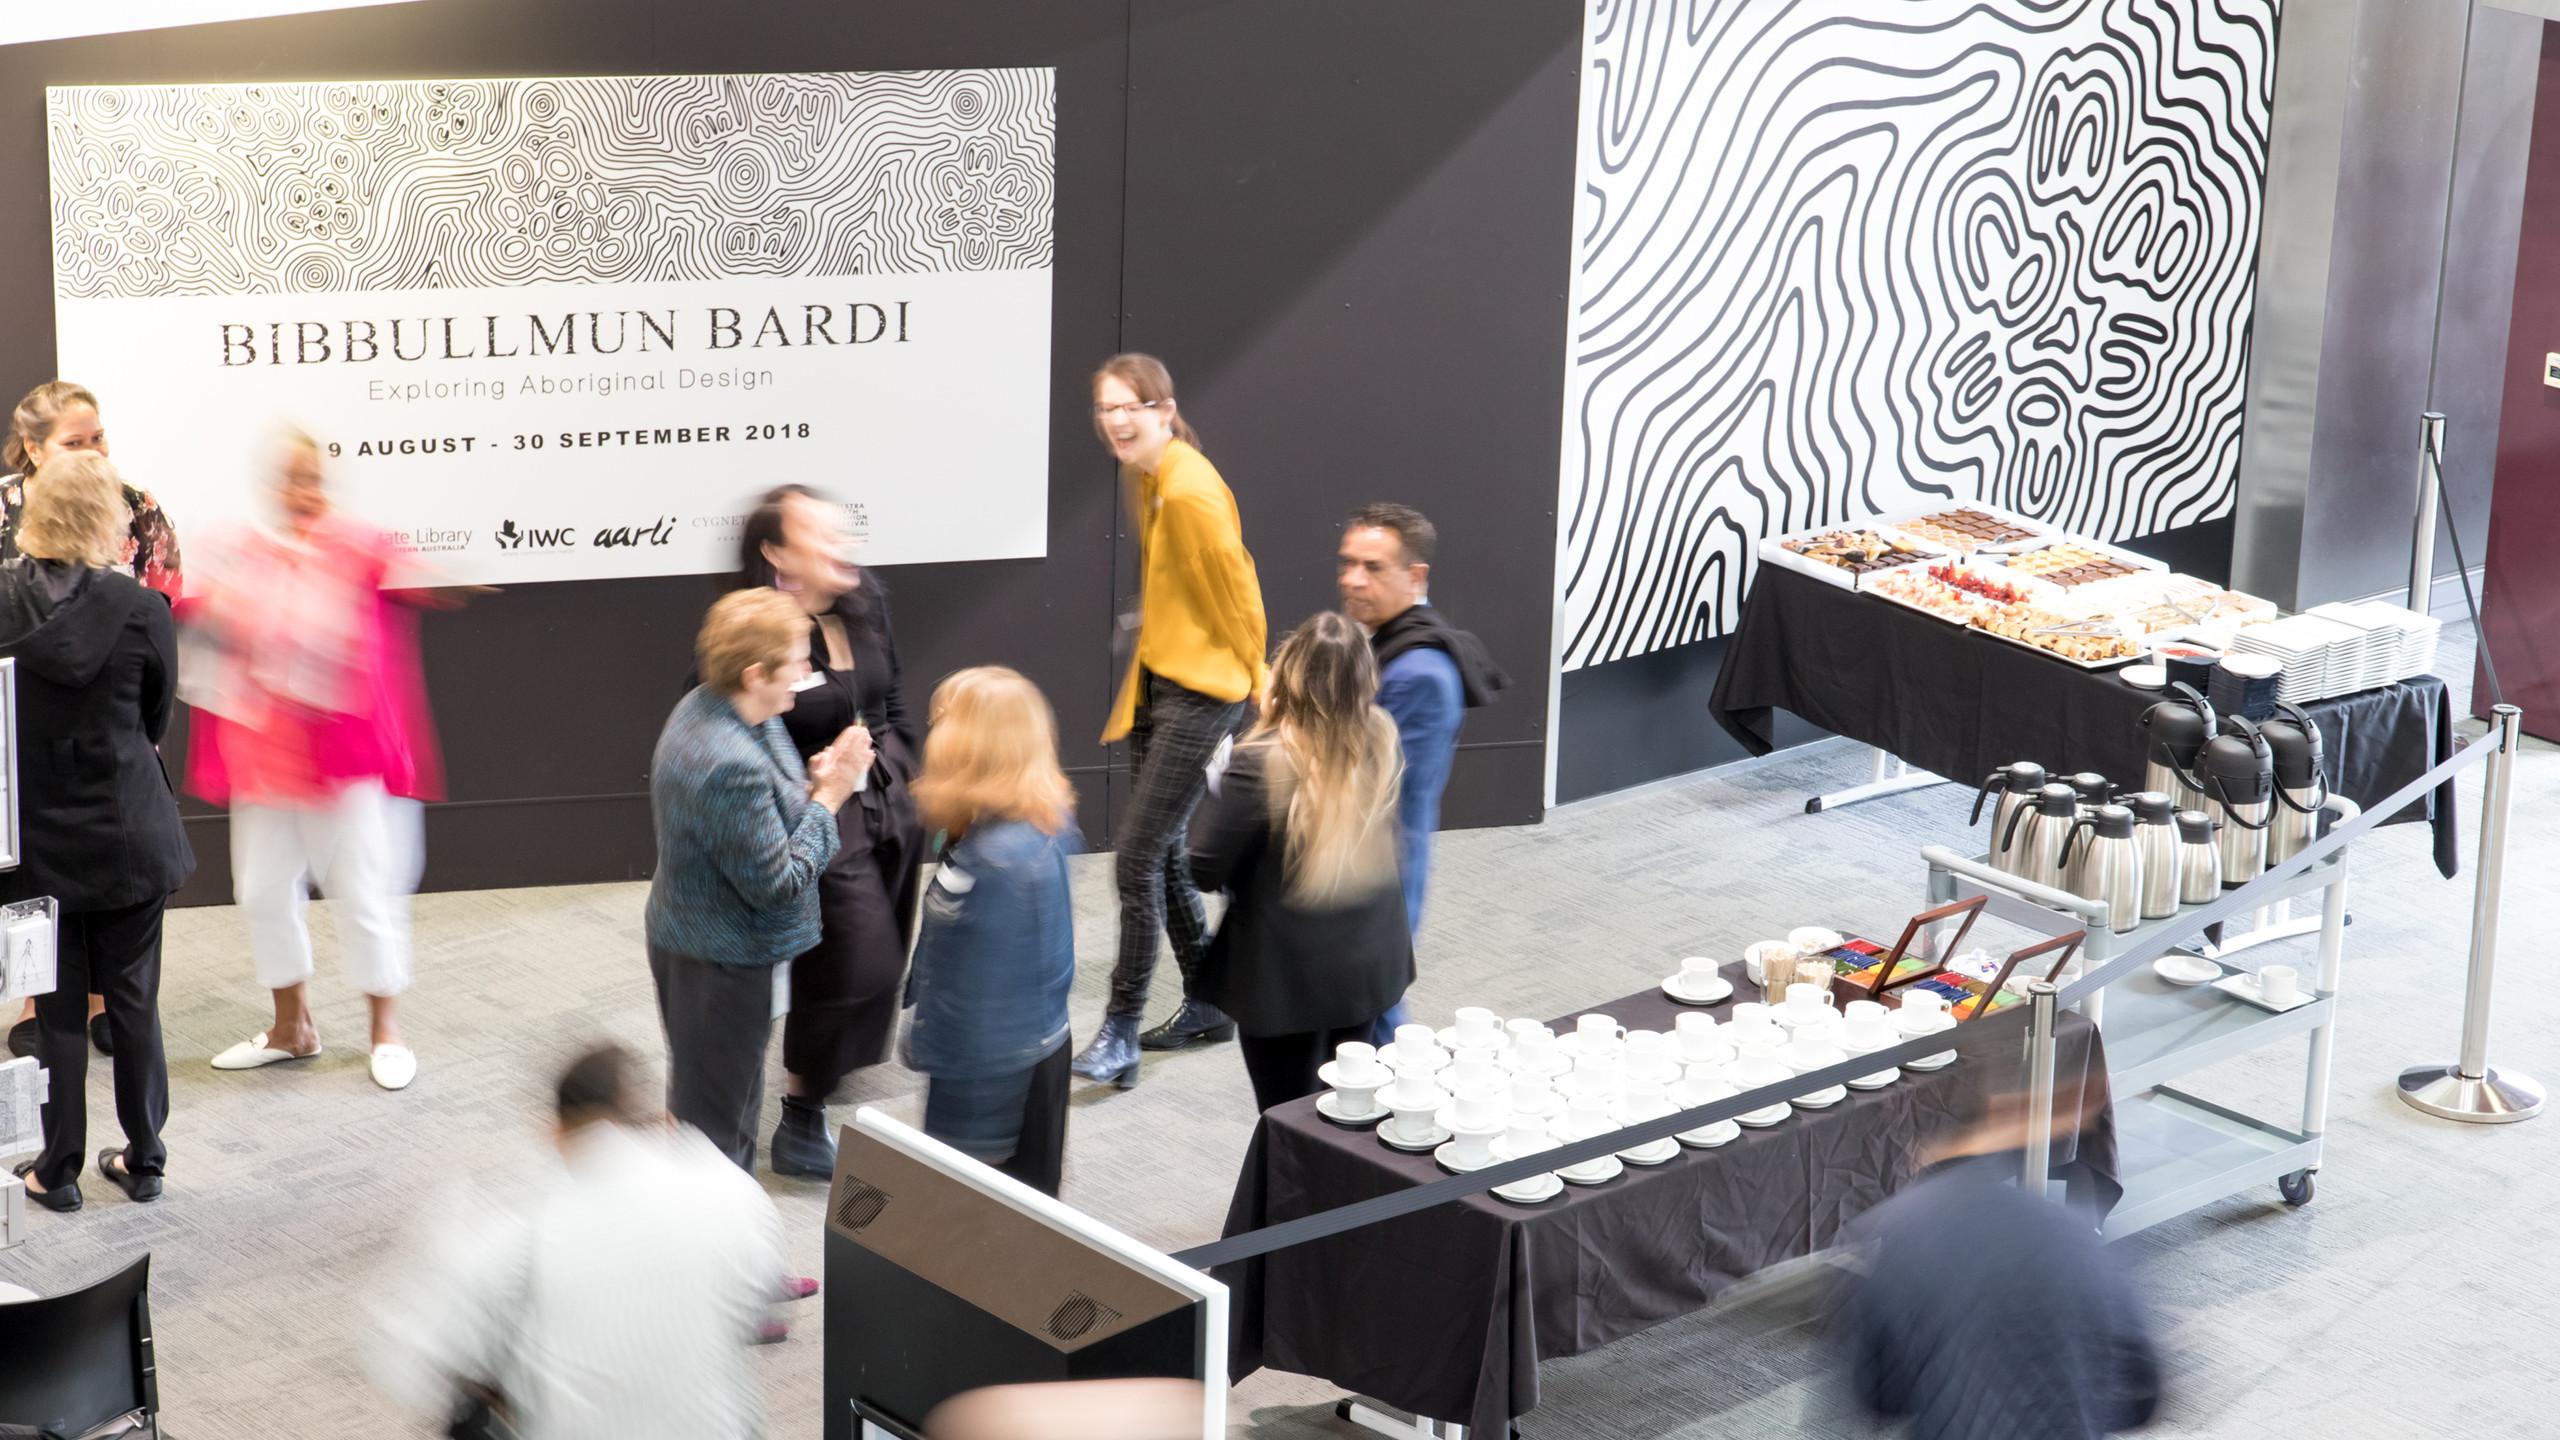 078A4078_Bibbullmun Bardi exhibition ope